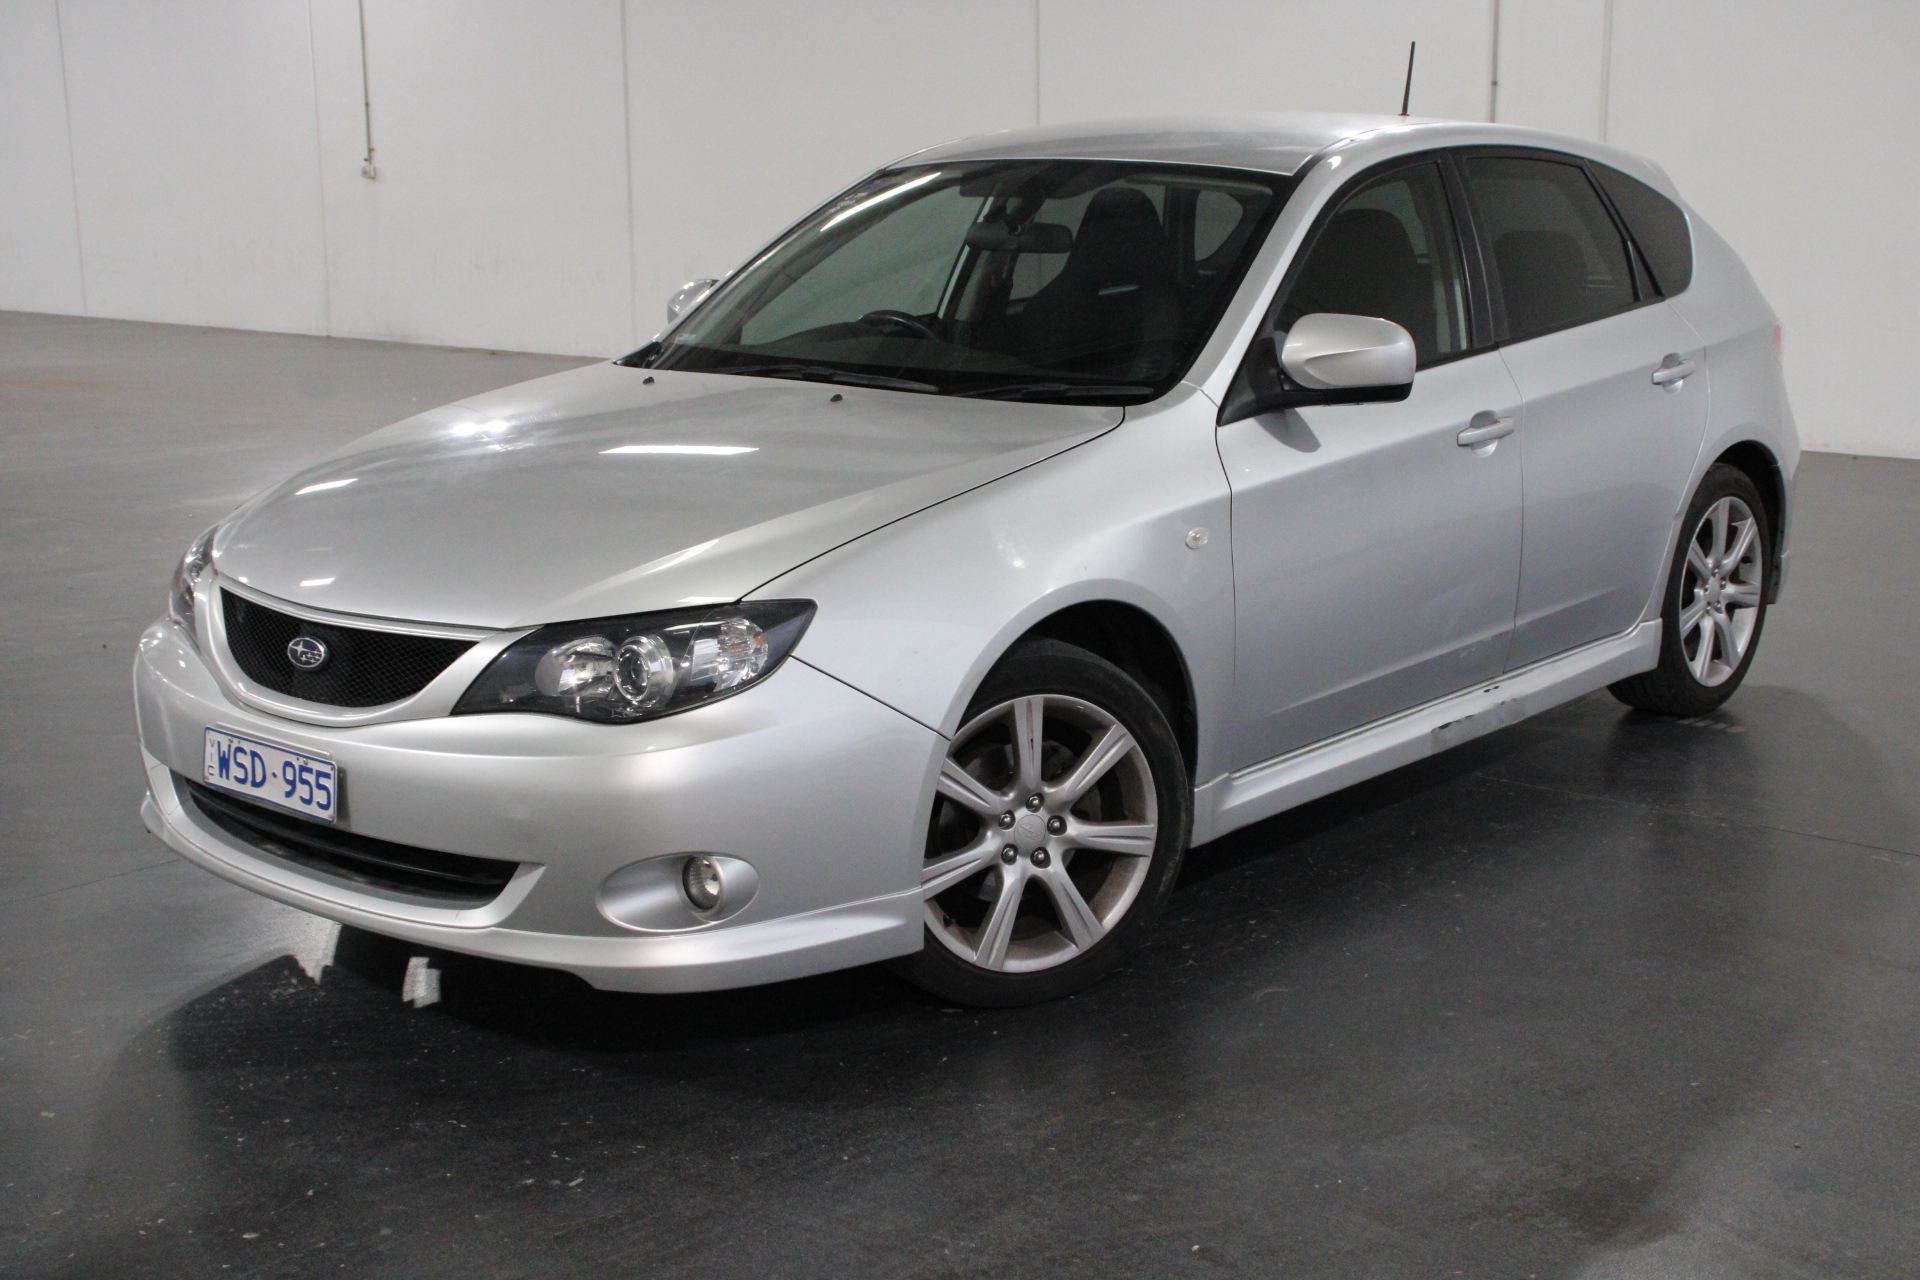 2008 Subaru Impreza RS (AWD) G3 Automatic Hatchback